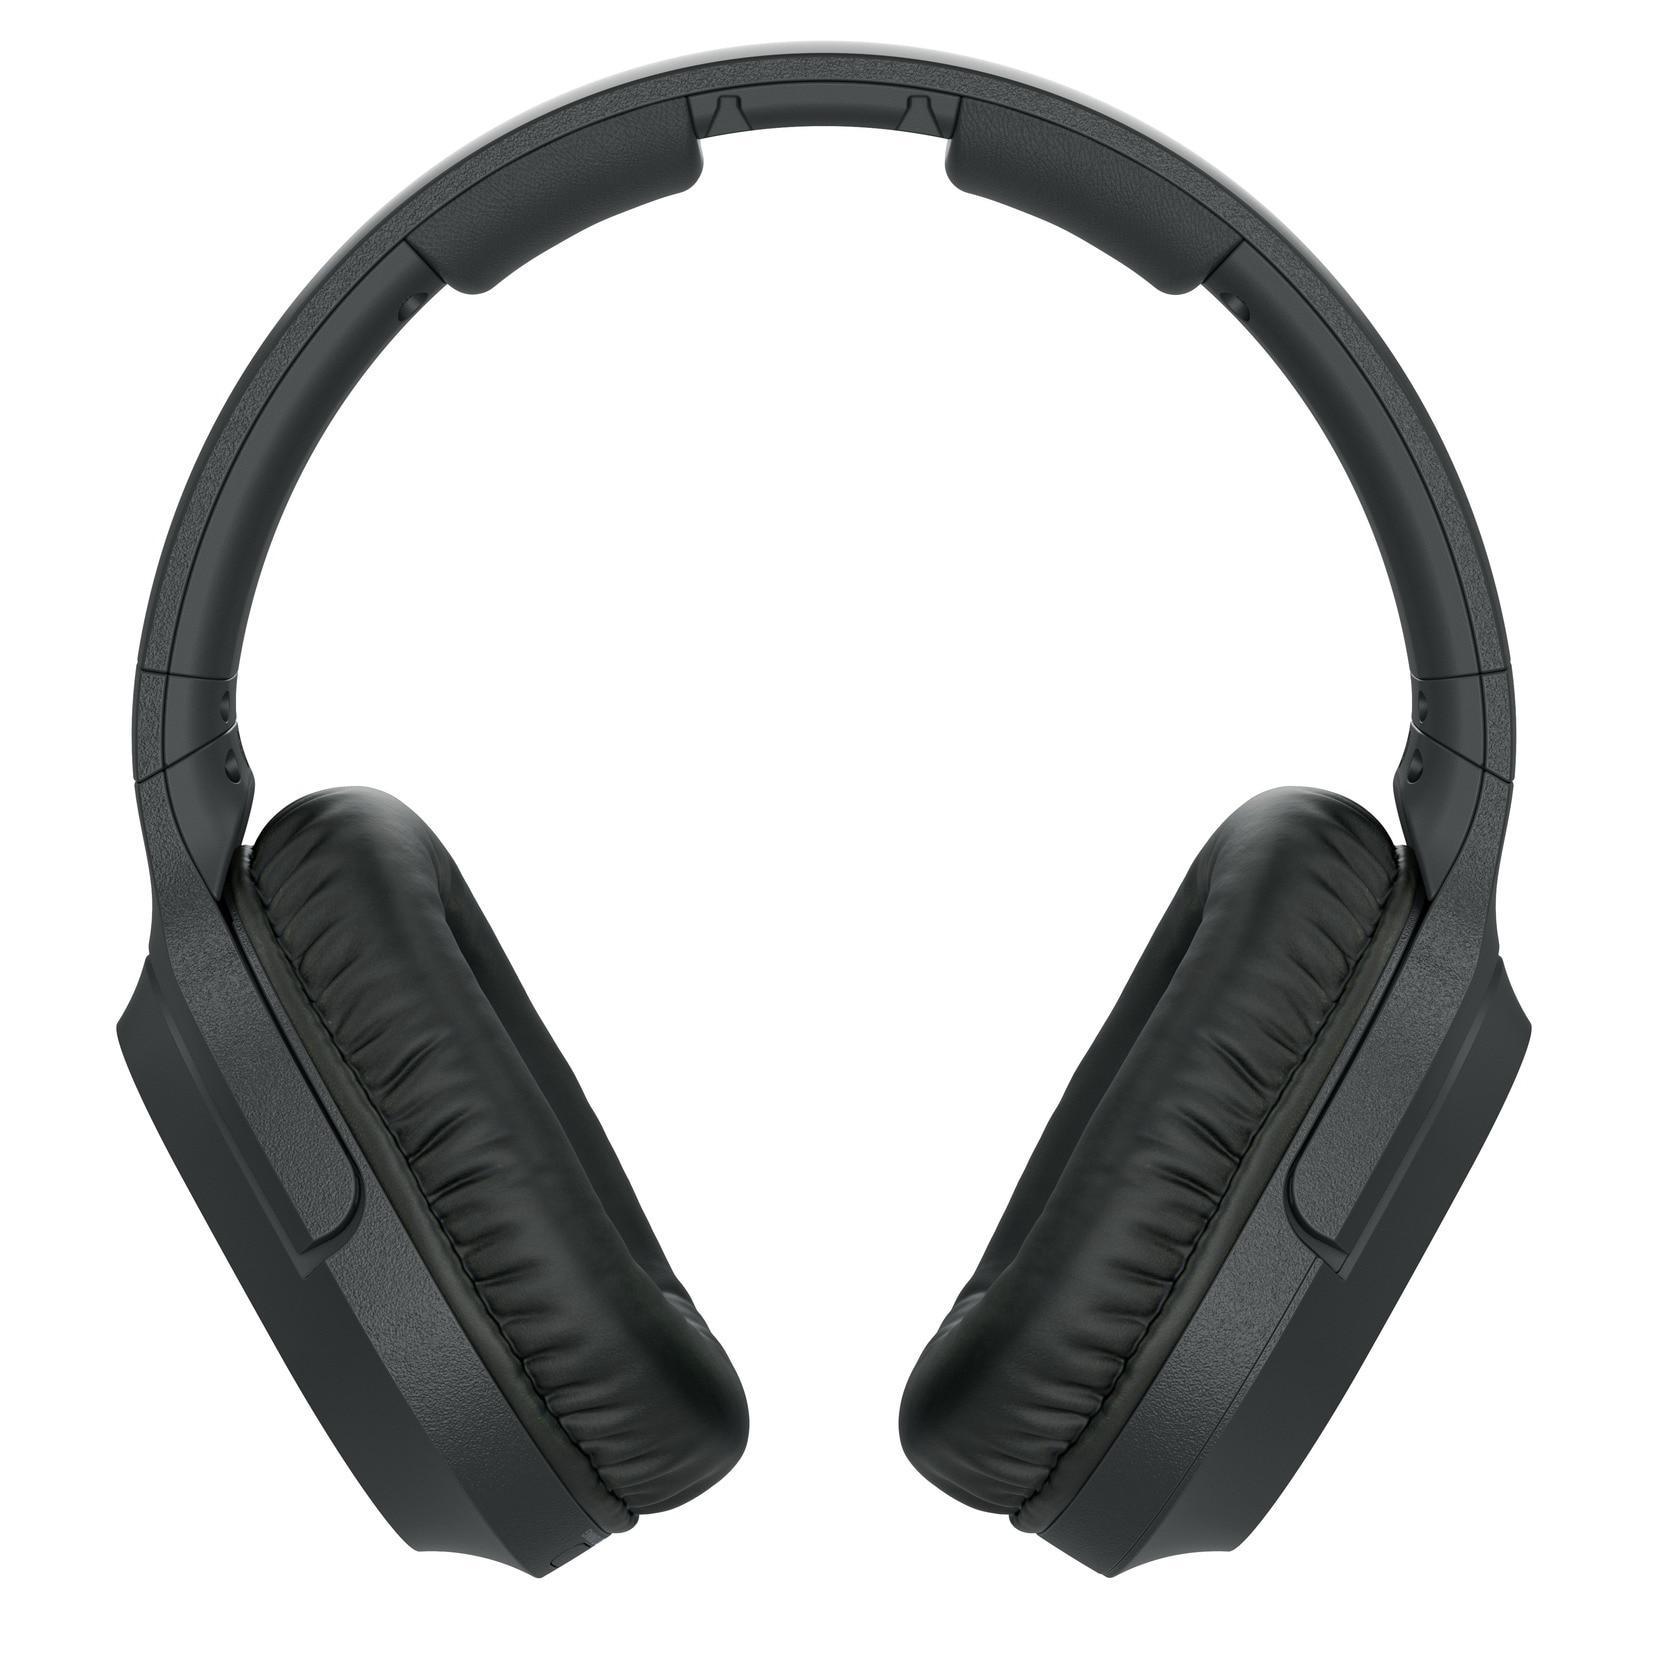 Sony MDR-RF895RK Headphones with microphone - Black